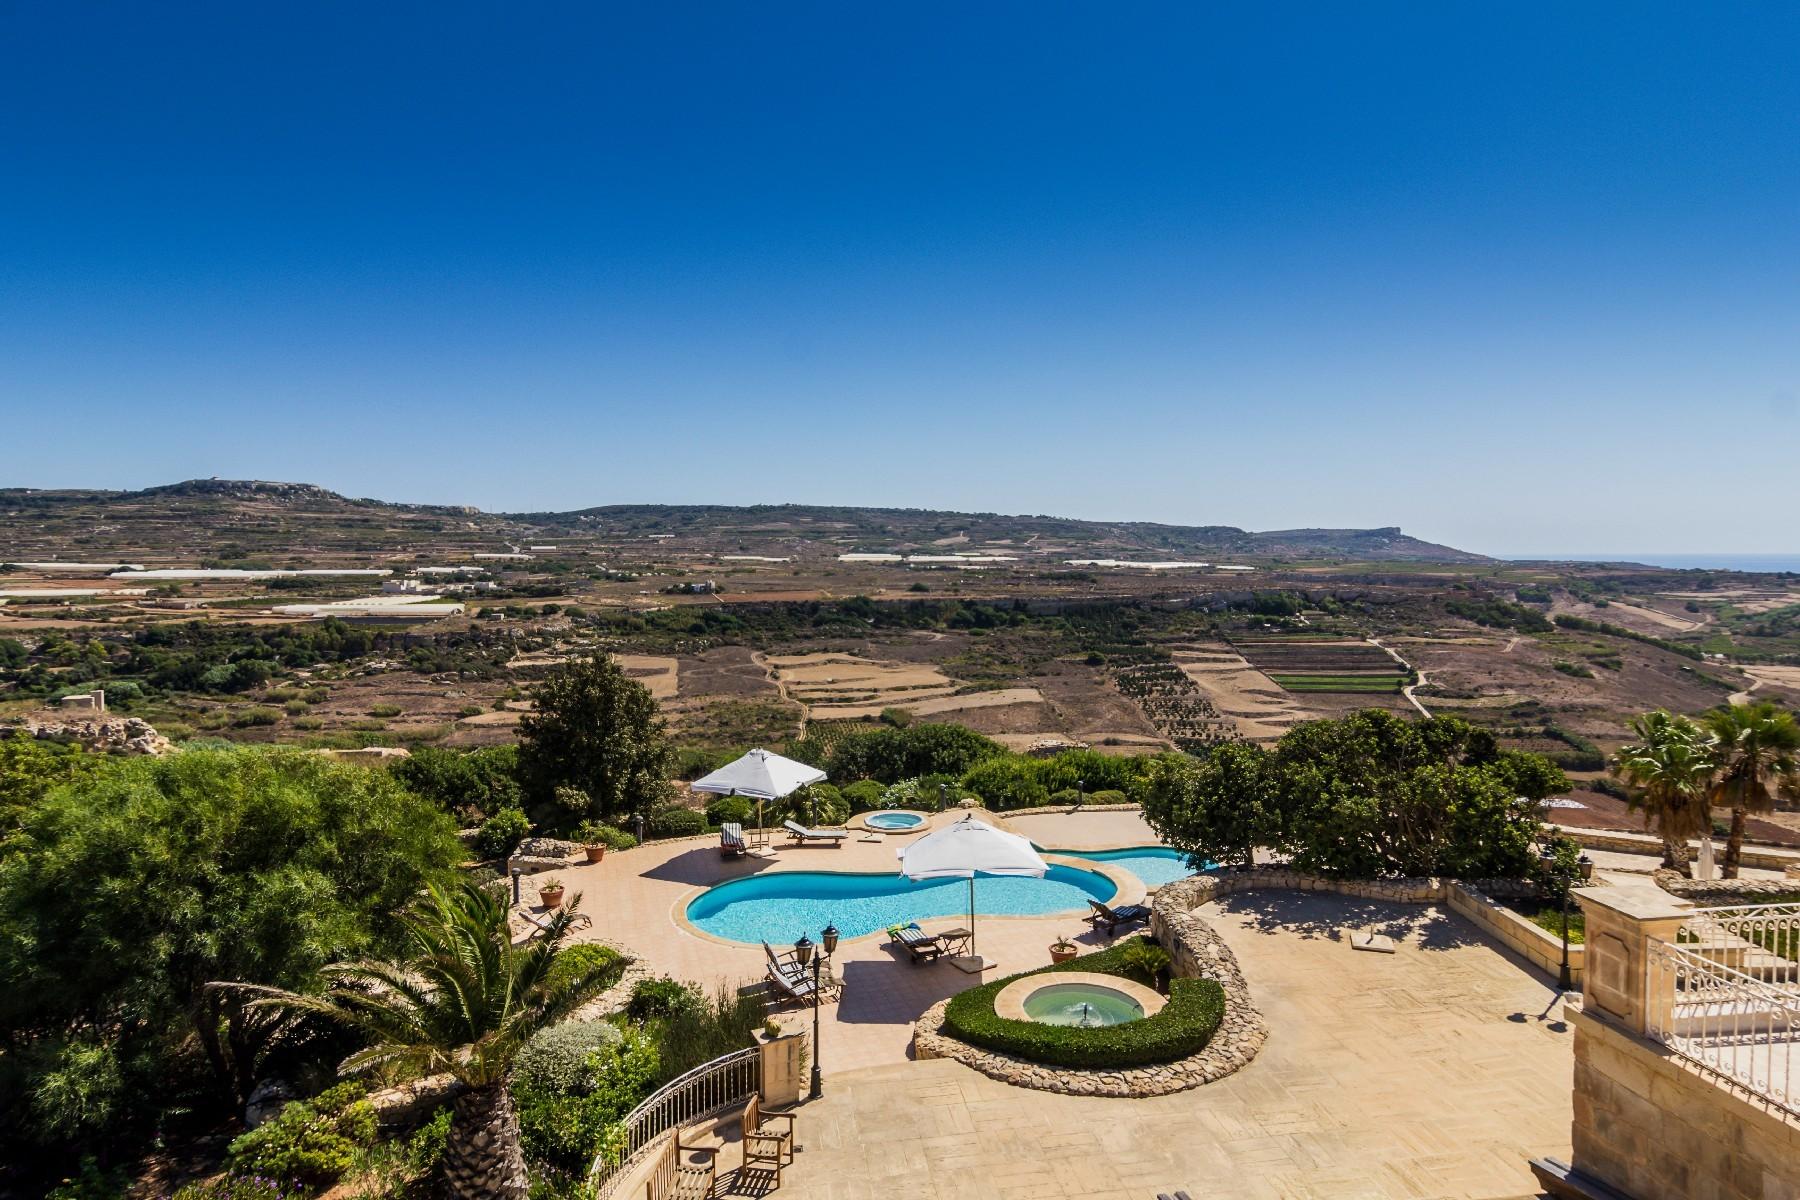 Malta Holiday rentals in Mgarr, Mgarr